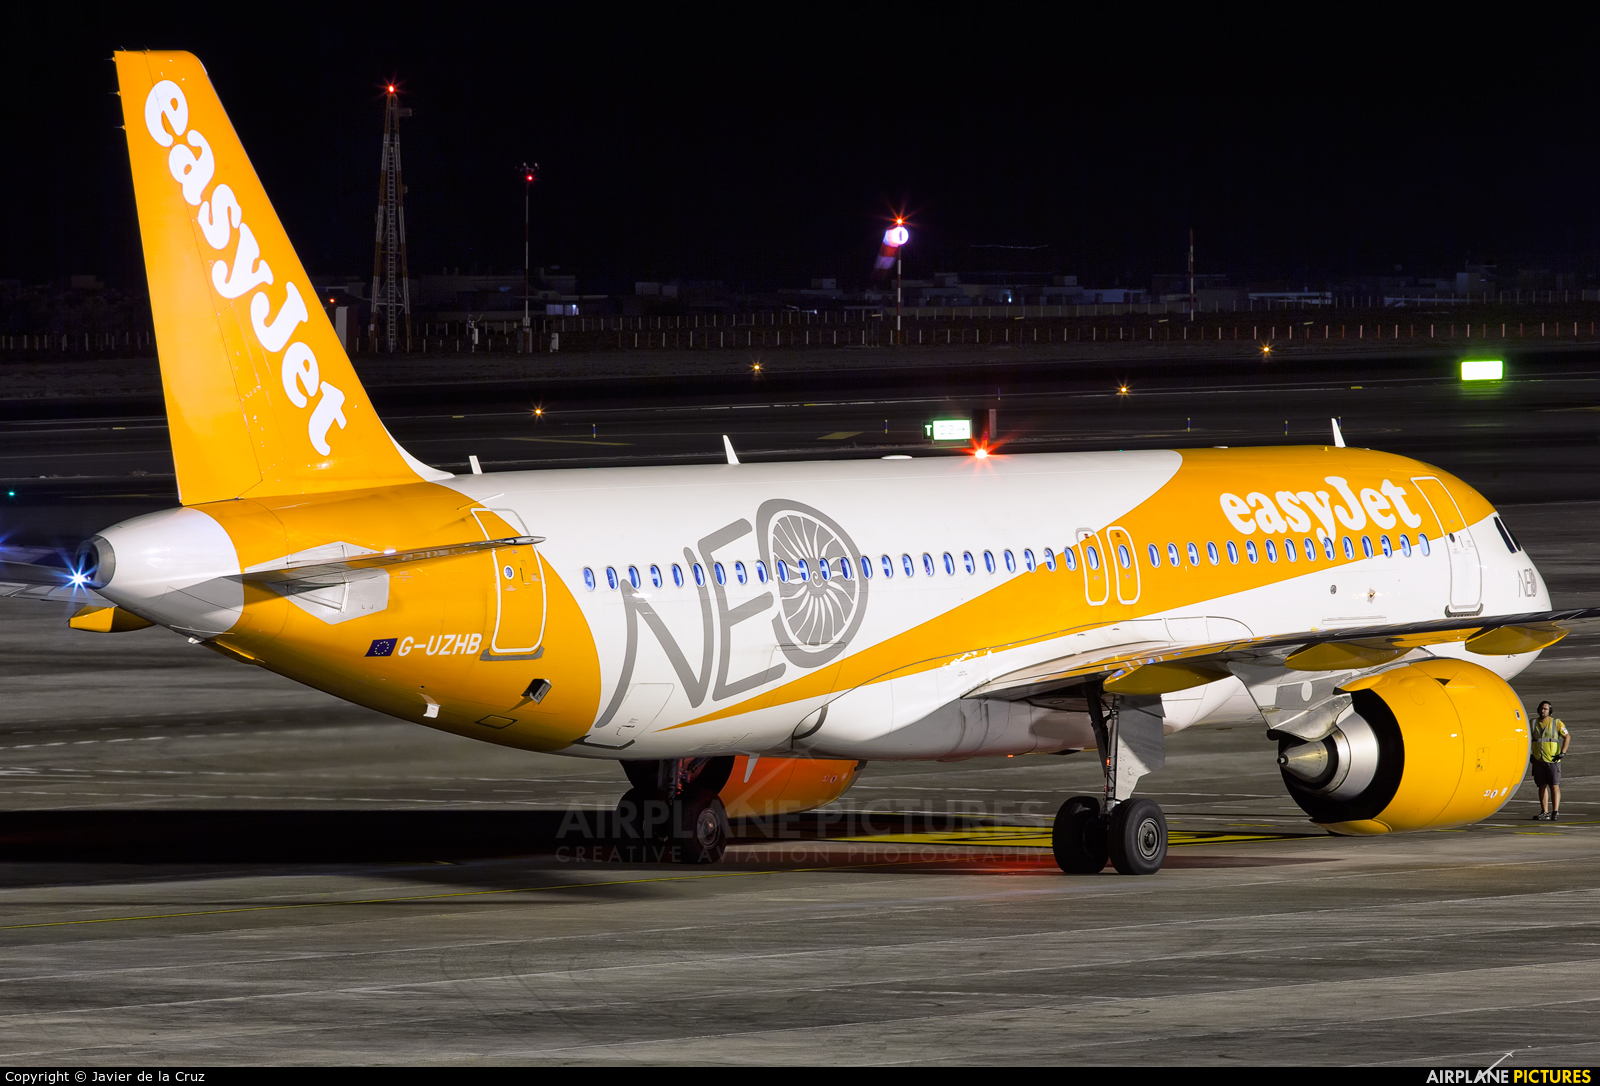 easyJet G-UZHB aircraft at Tenerife Sur - Reina Sofia